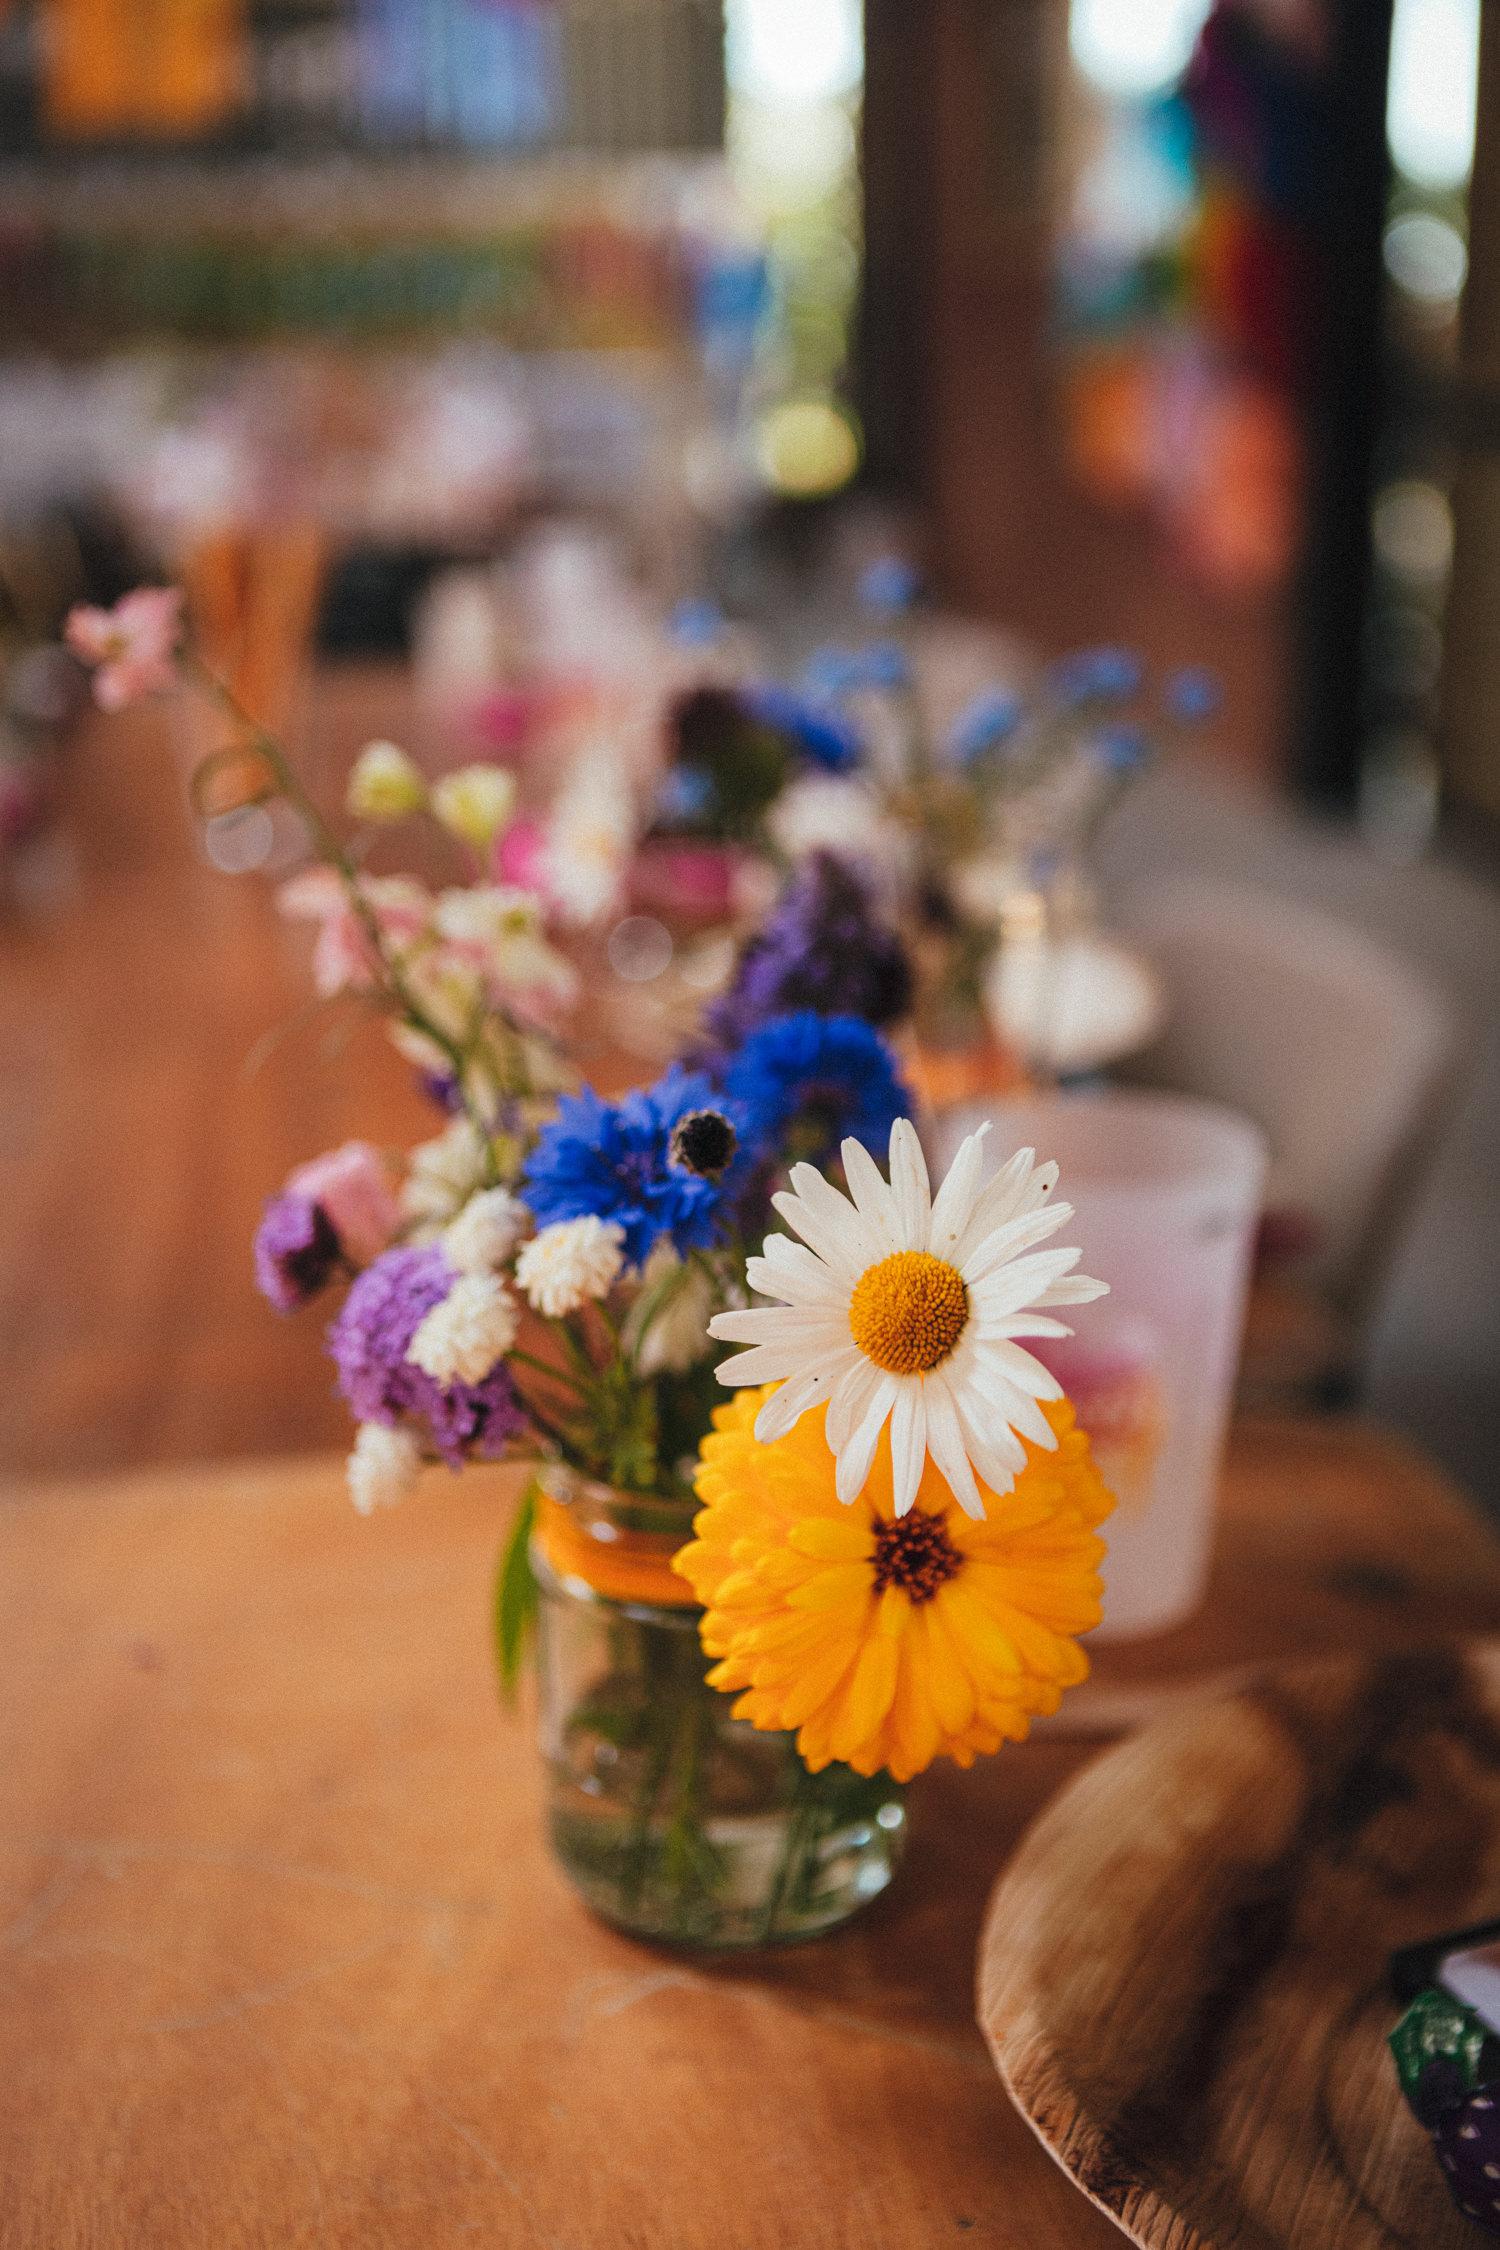 colourful flowers, bouquet, boho wedding, boho bride, hippy wedding, farm wedding, flowers, bright colours, Holsome Park Wedding Photography, totnes wedding, farm wedding, festival wedding